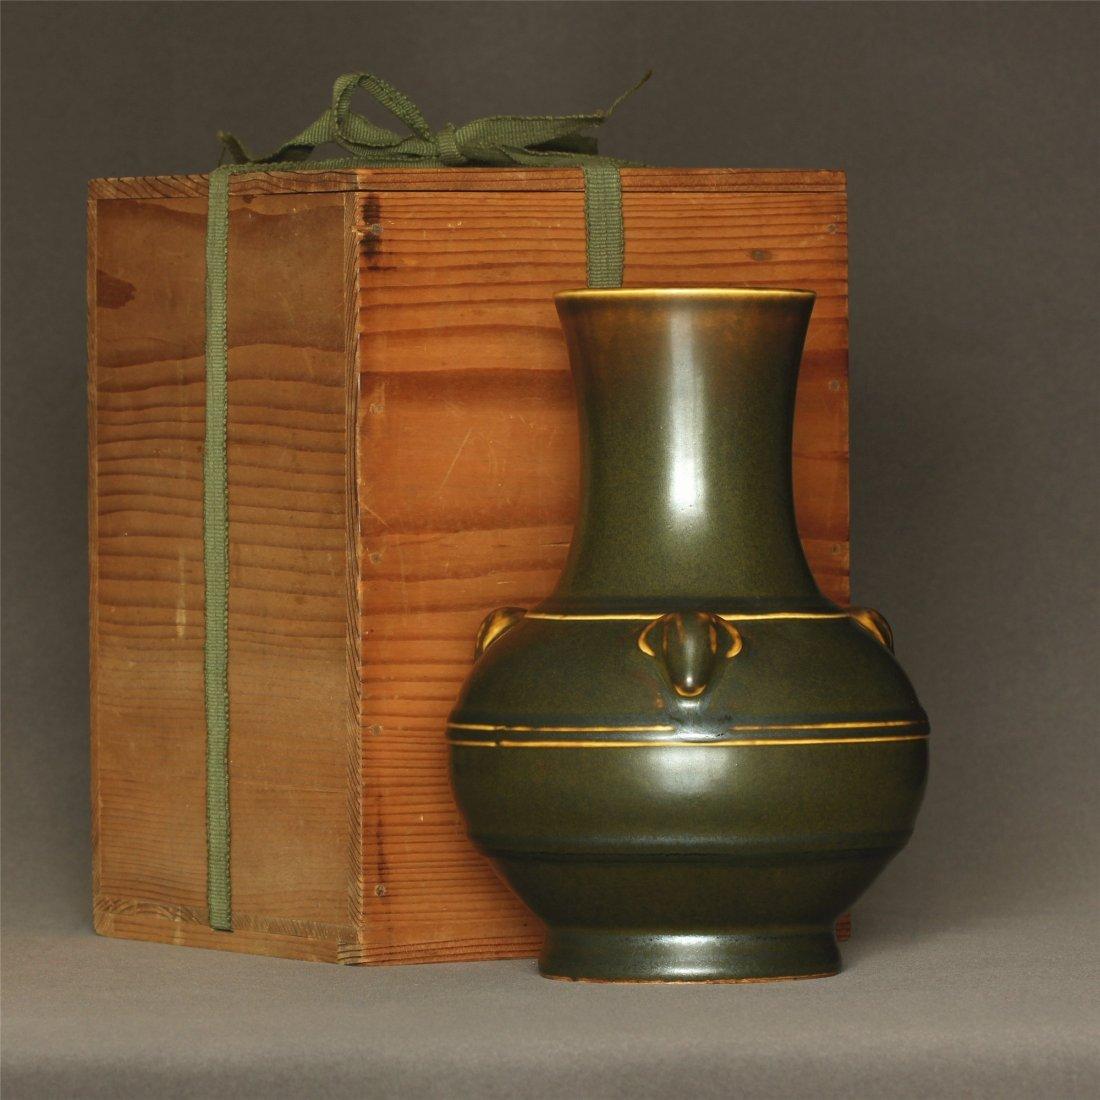 Tea glaze porcelain vase of Qing Dynasty QianLong - 3